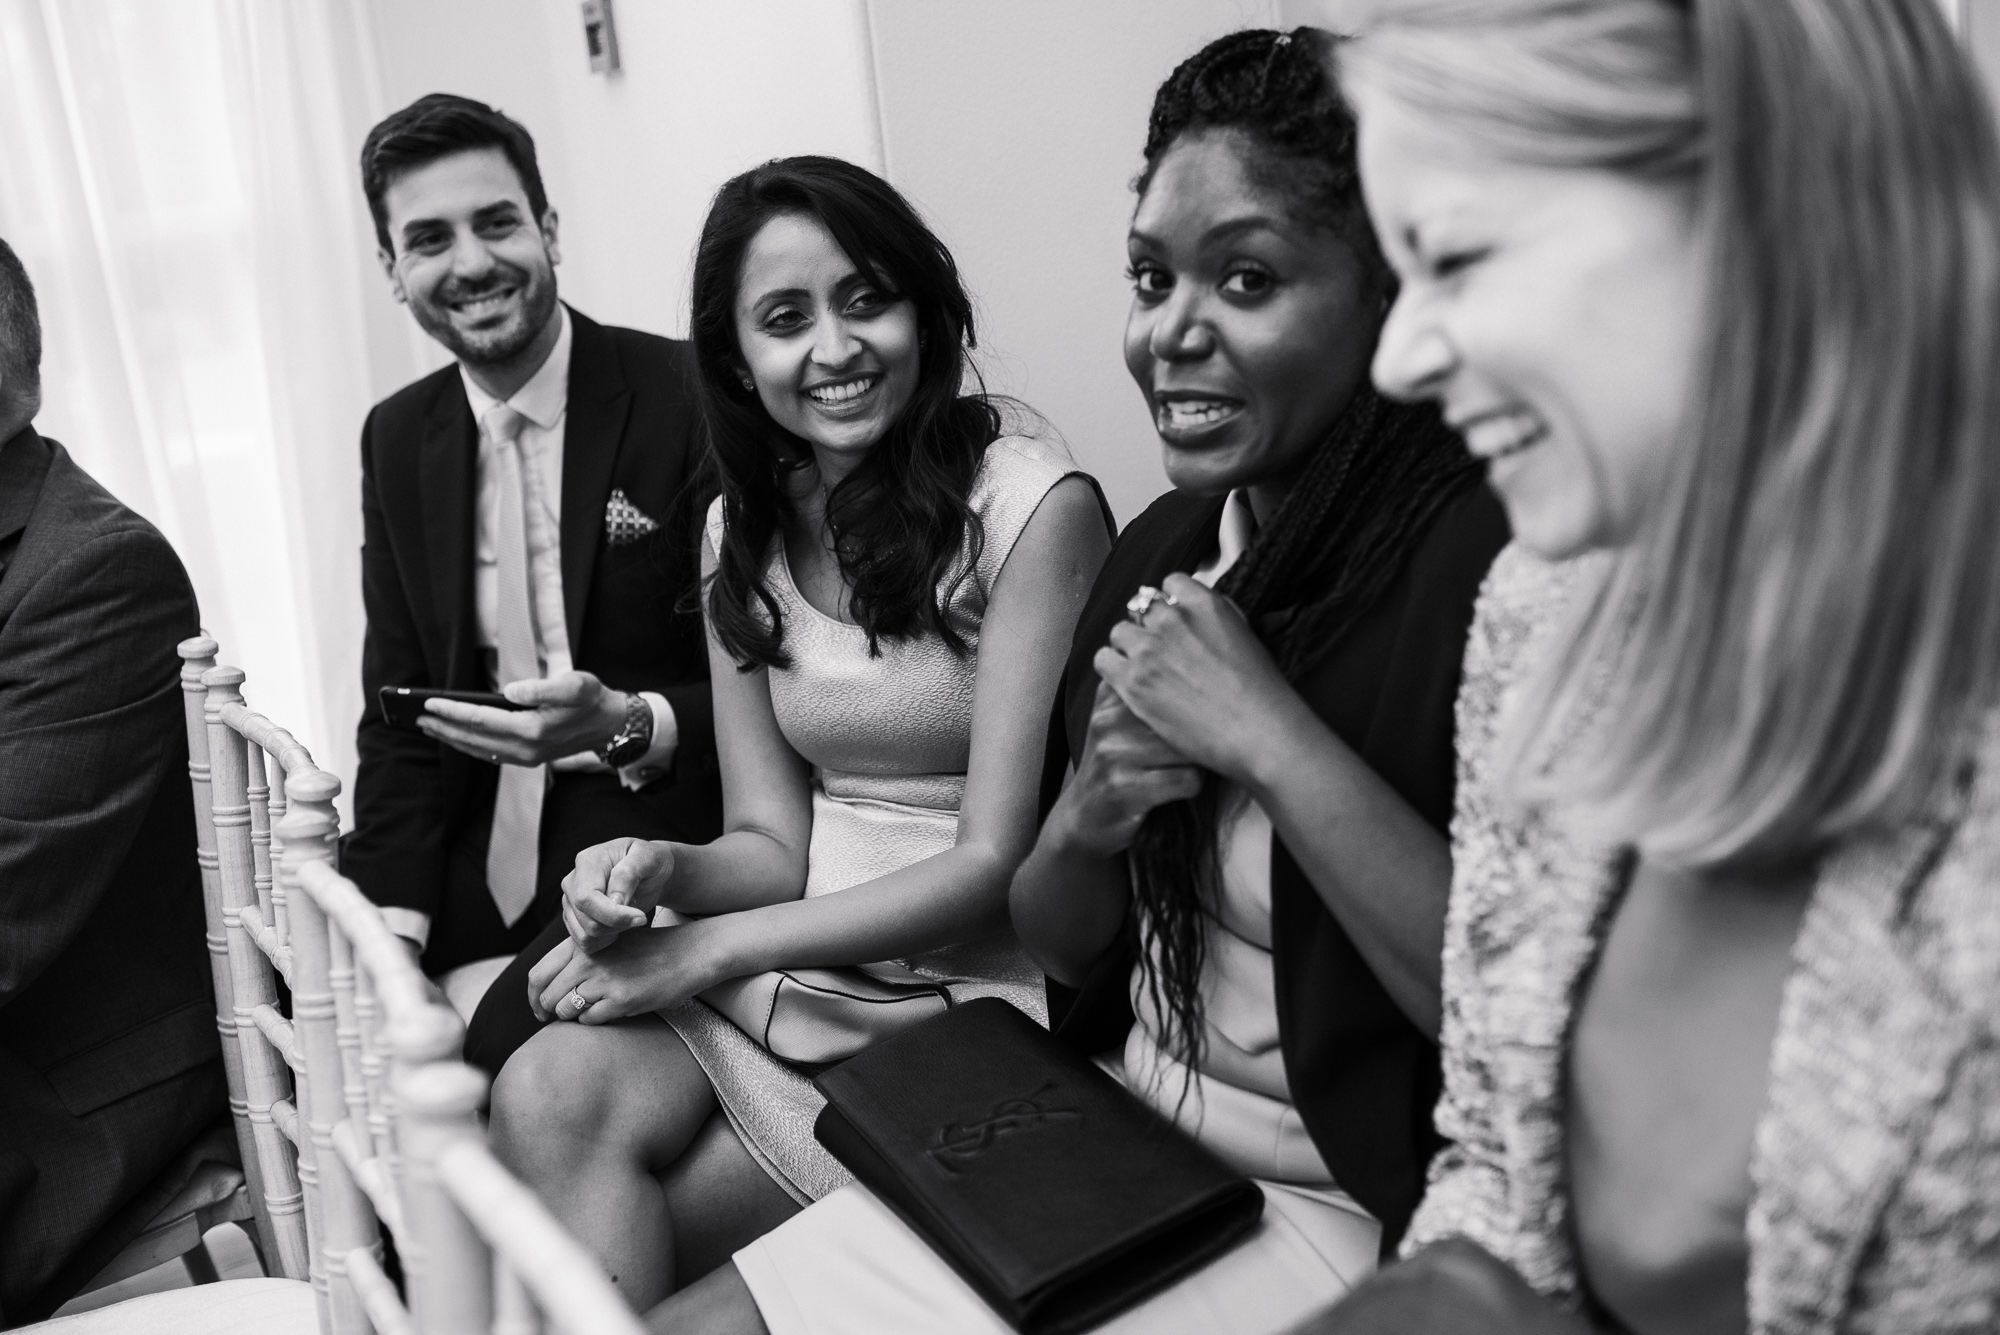 Pembroke lodge wedding guests